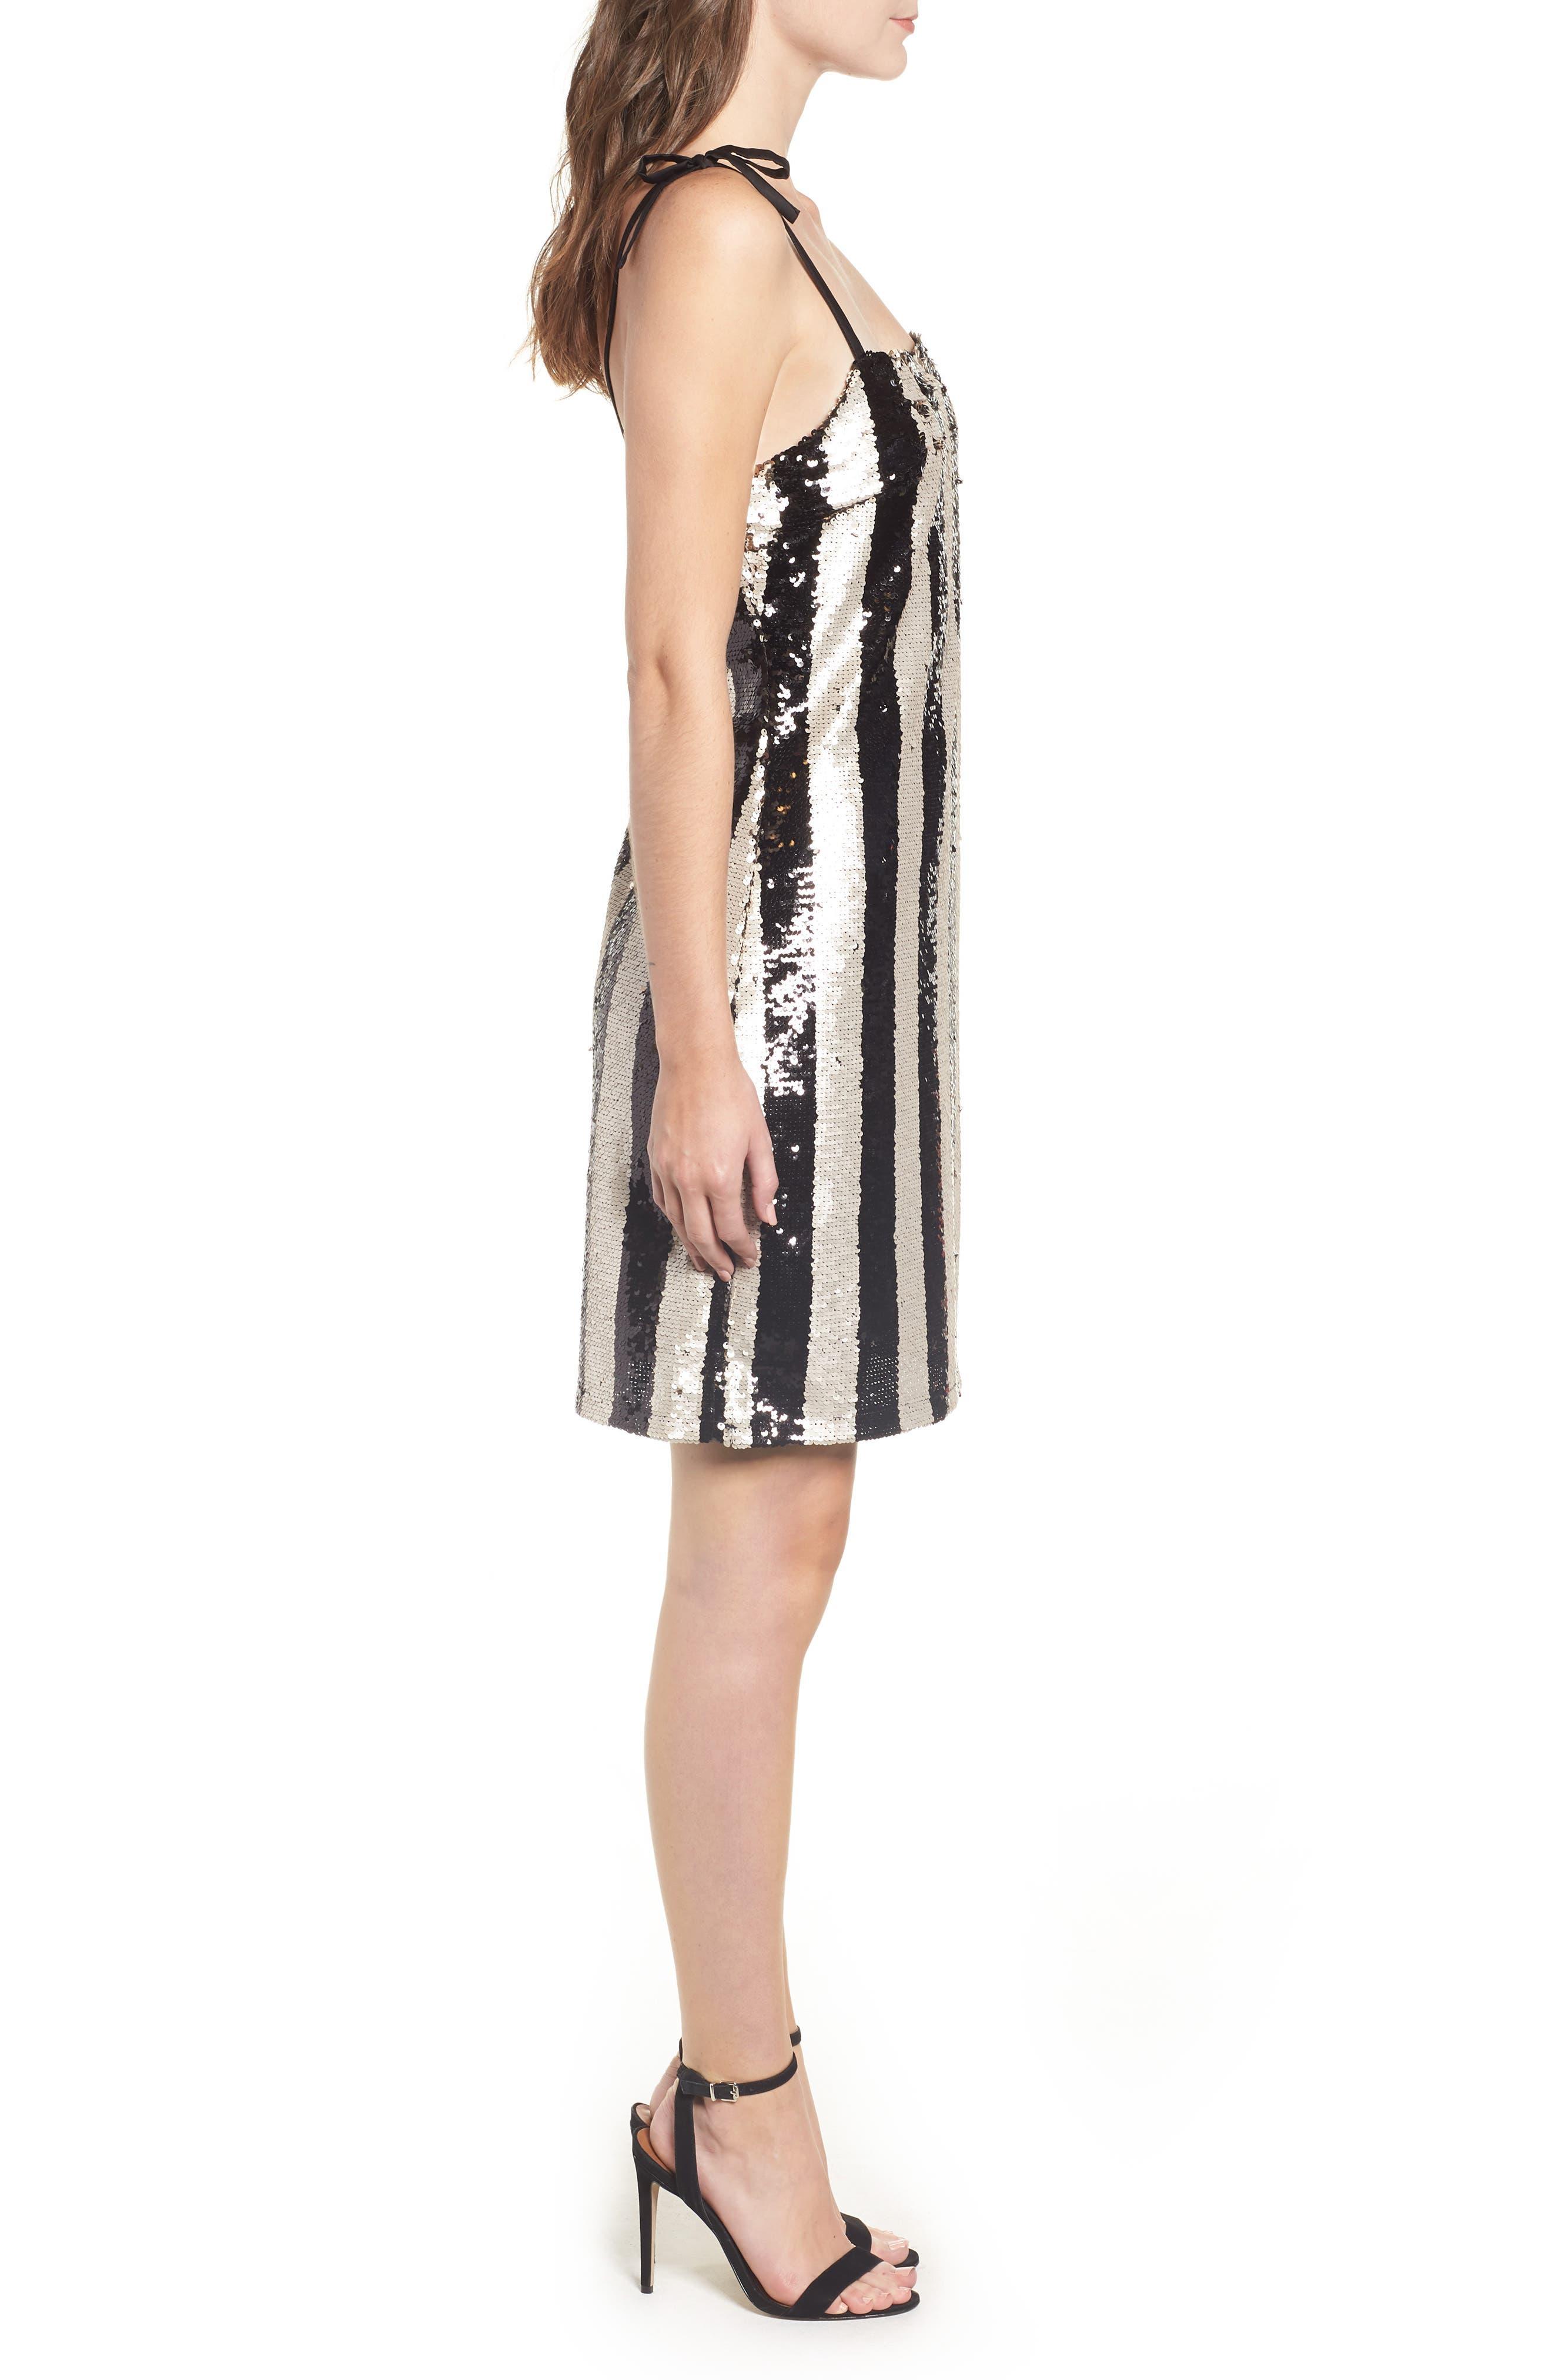 CUPCAKES AND CASHMERE, Vertical Sequin Stripe Dress, Alternate thumbnail 4, color, BLACK